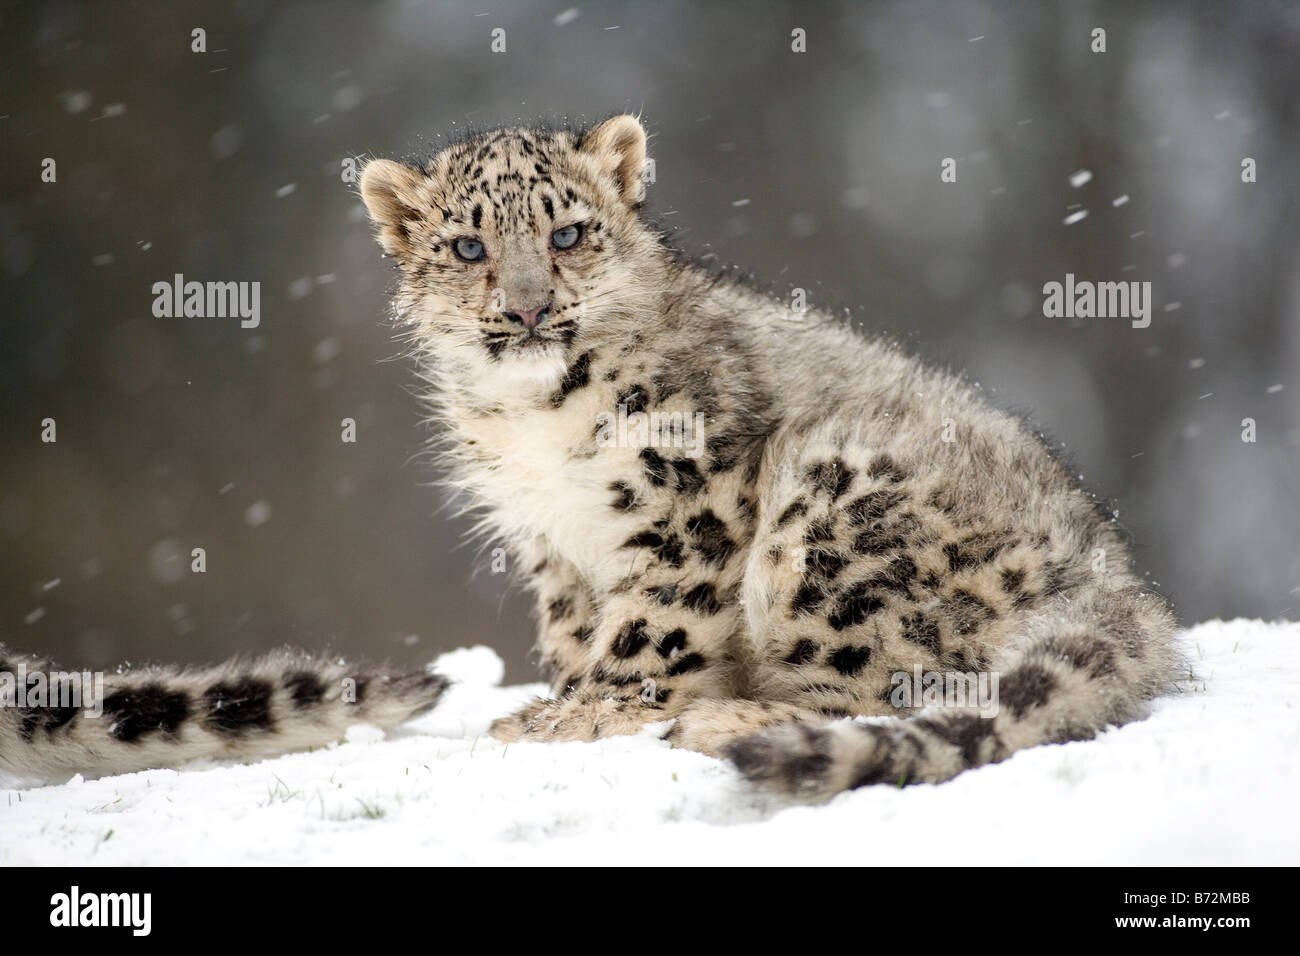 Snow Leopard Cub im Schnee Stockbild